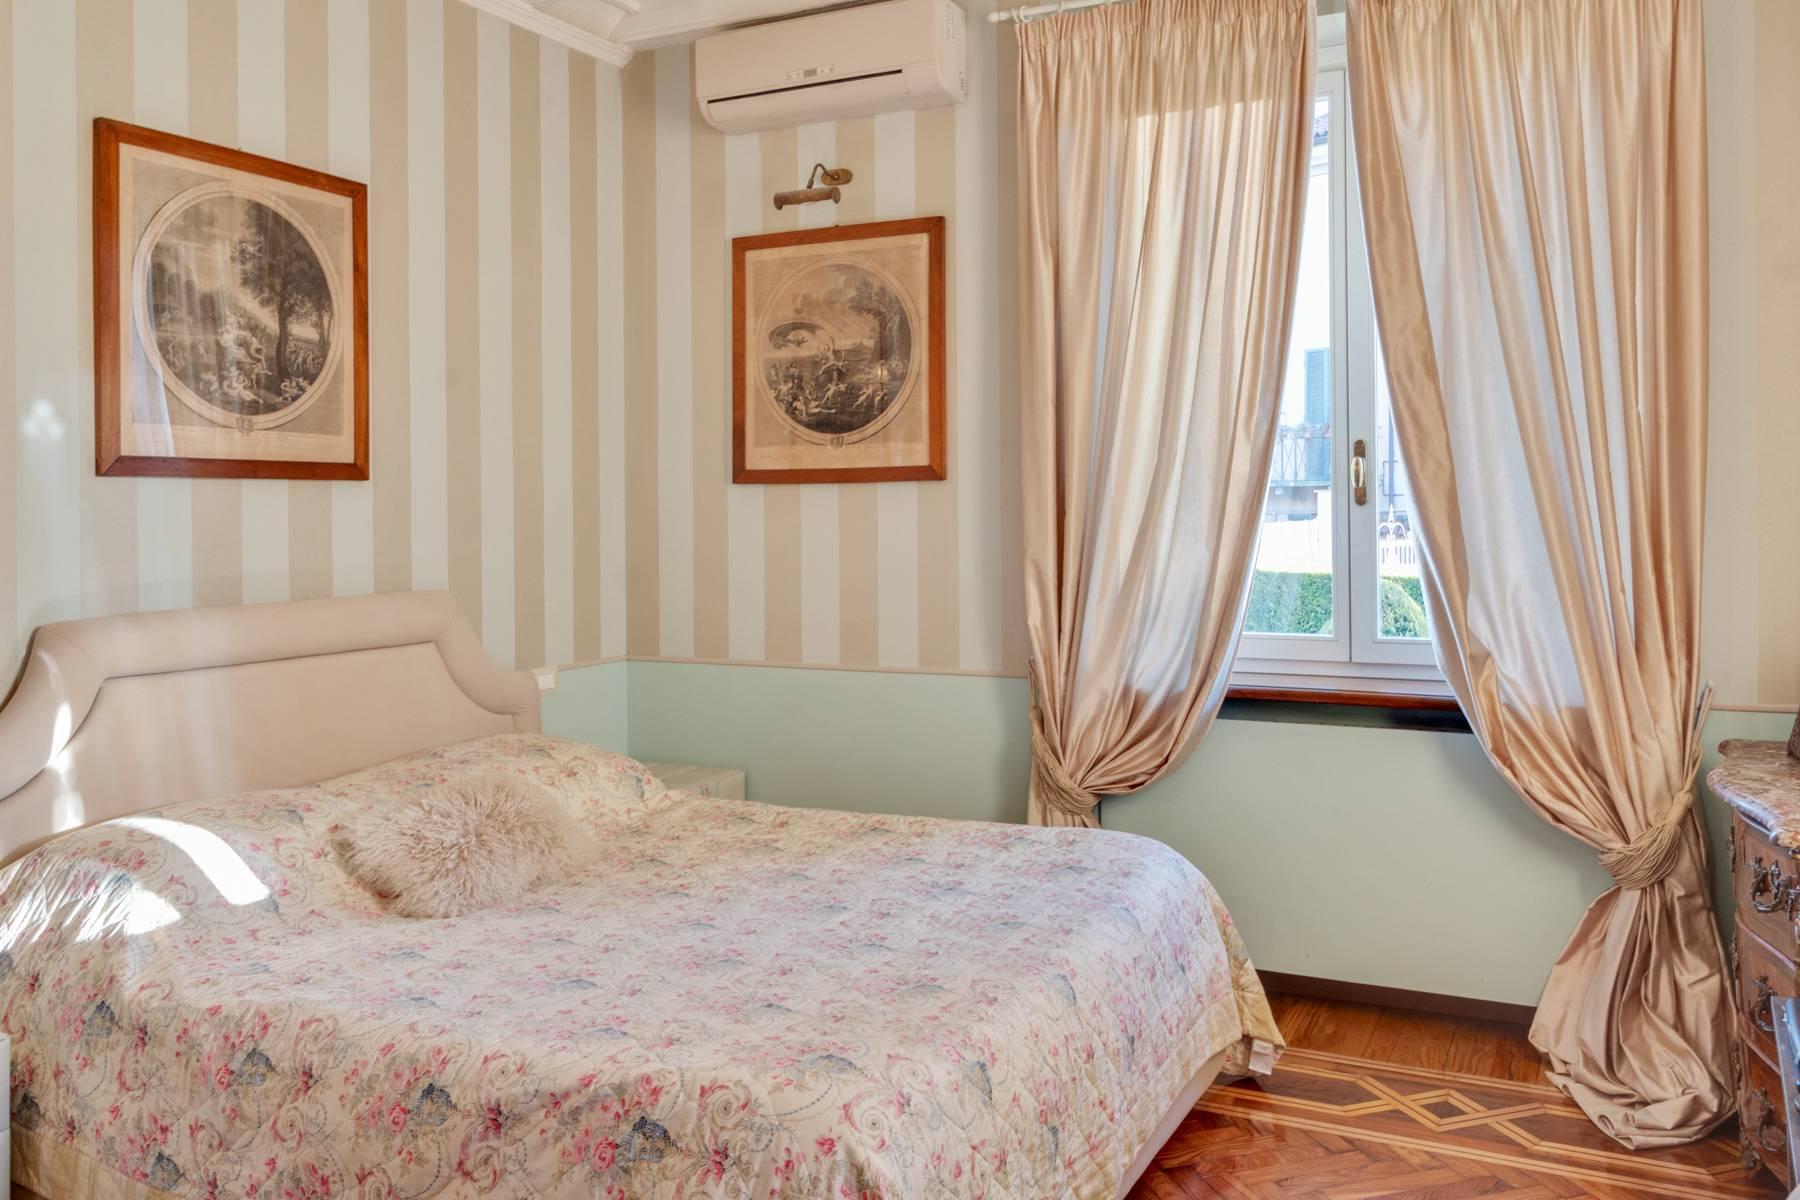 Casa indipendente in Vendita a Torino: 5 locali, 270 mq - Foto 12